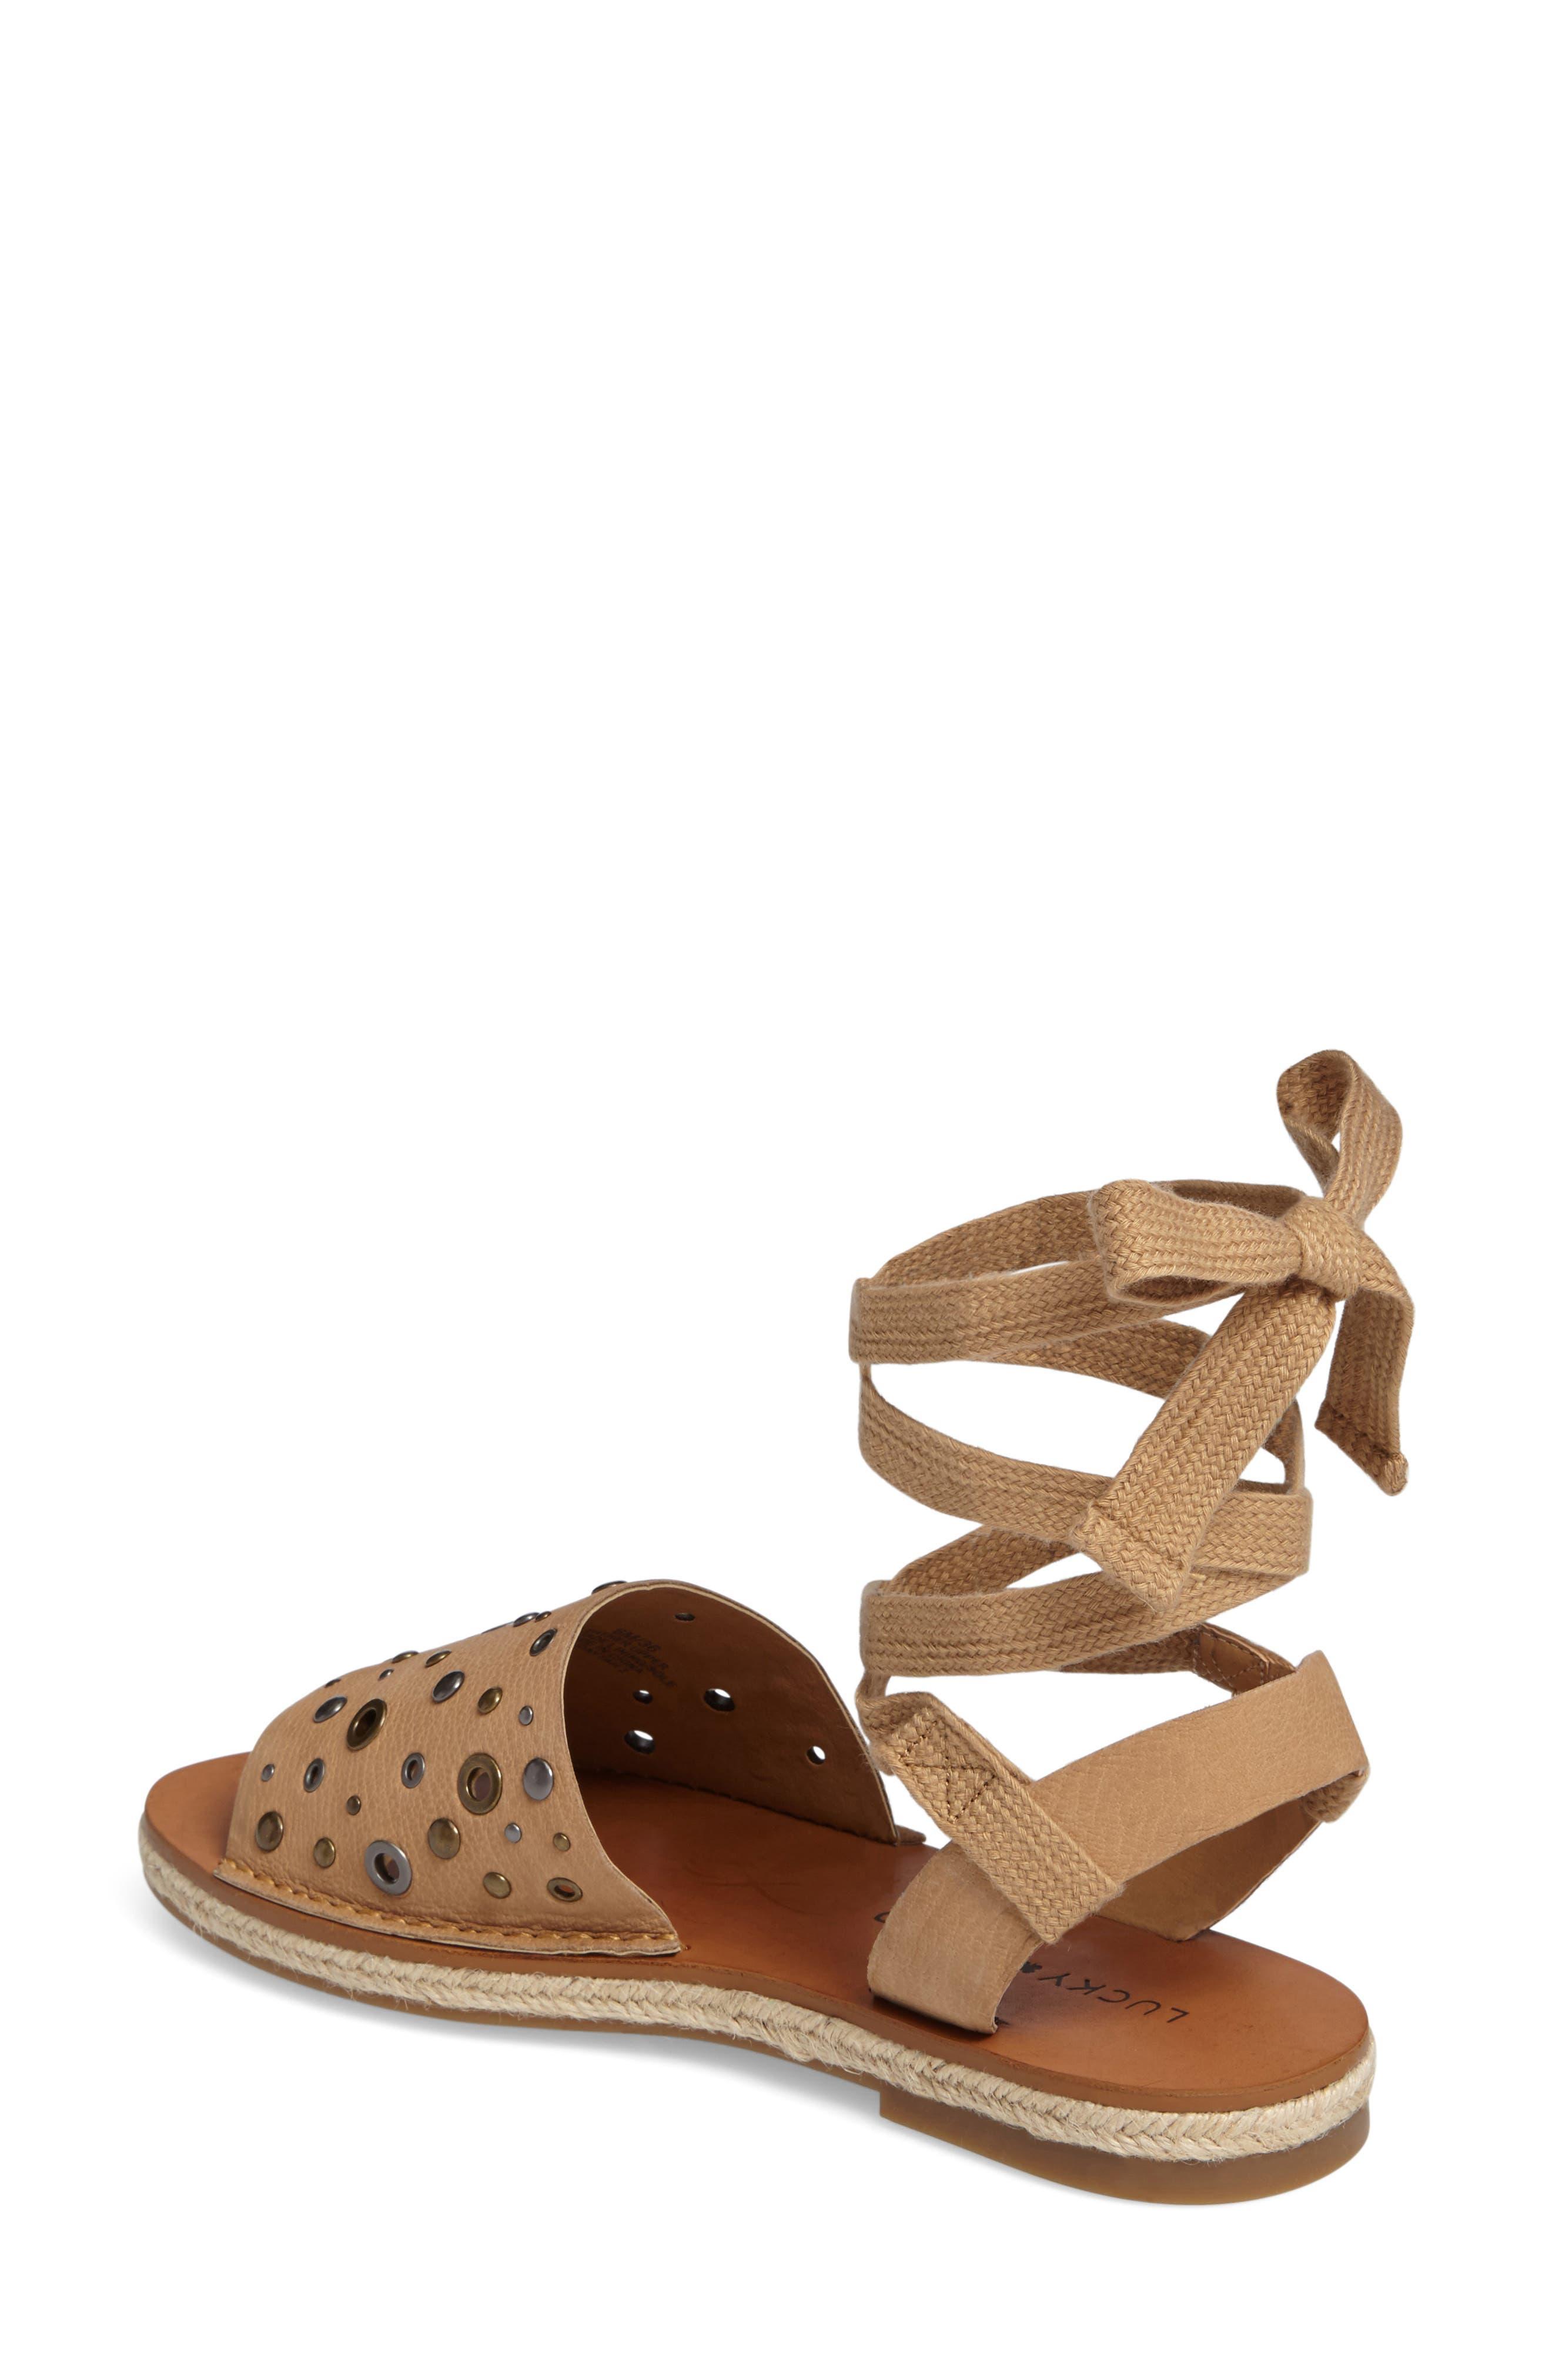 Daytah Ankle Tie Sandal,                             Alternate thumbnail 7, color,